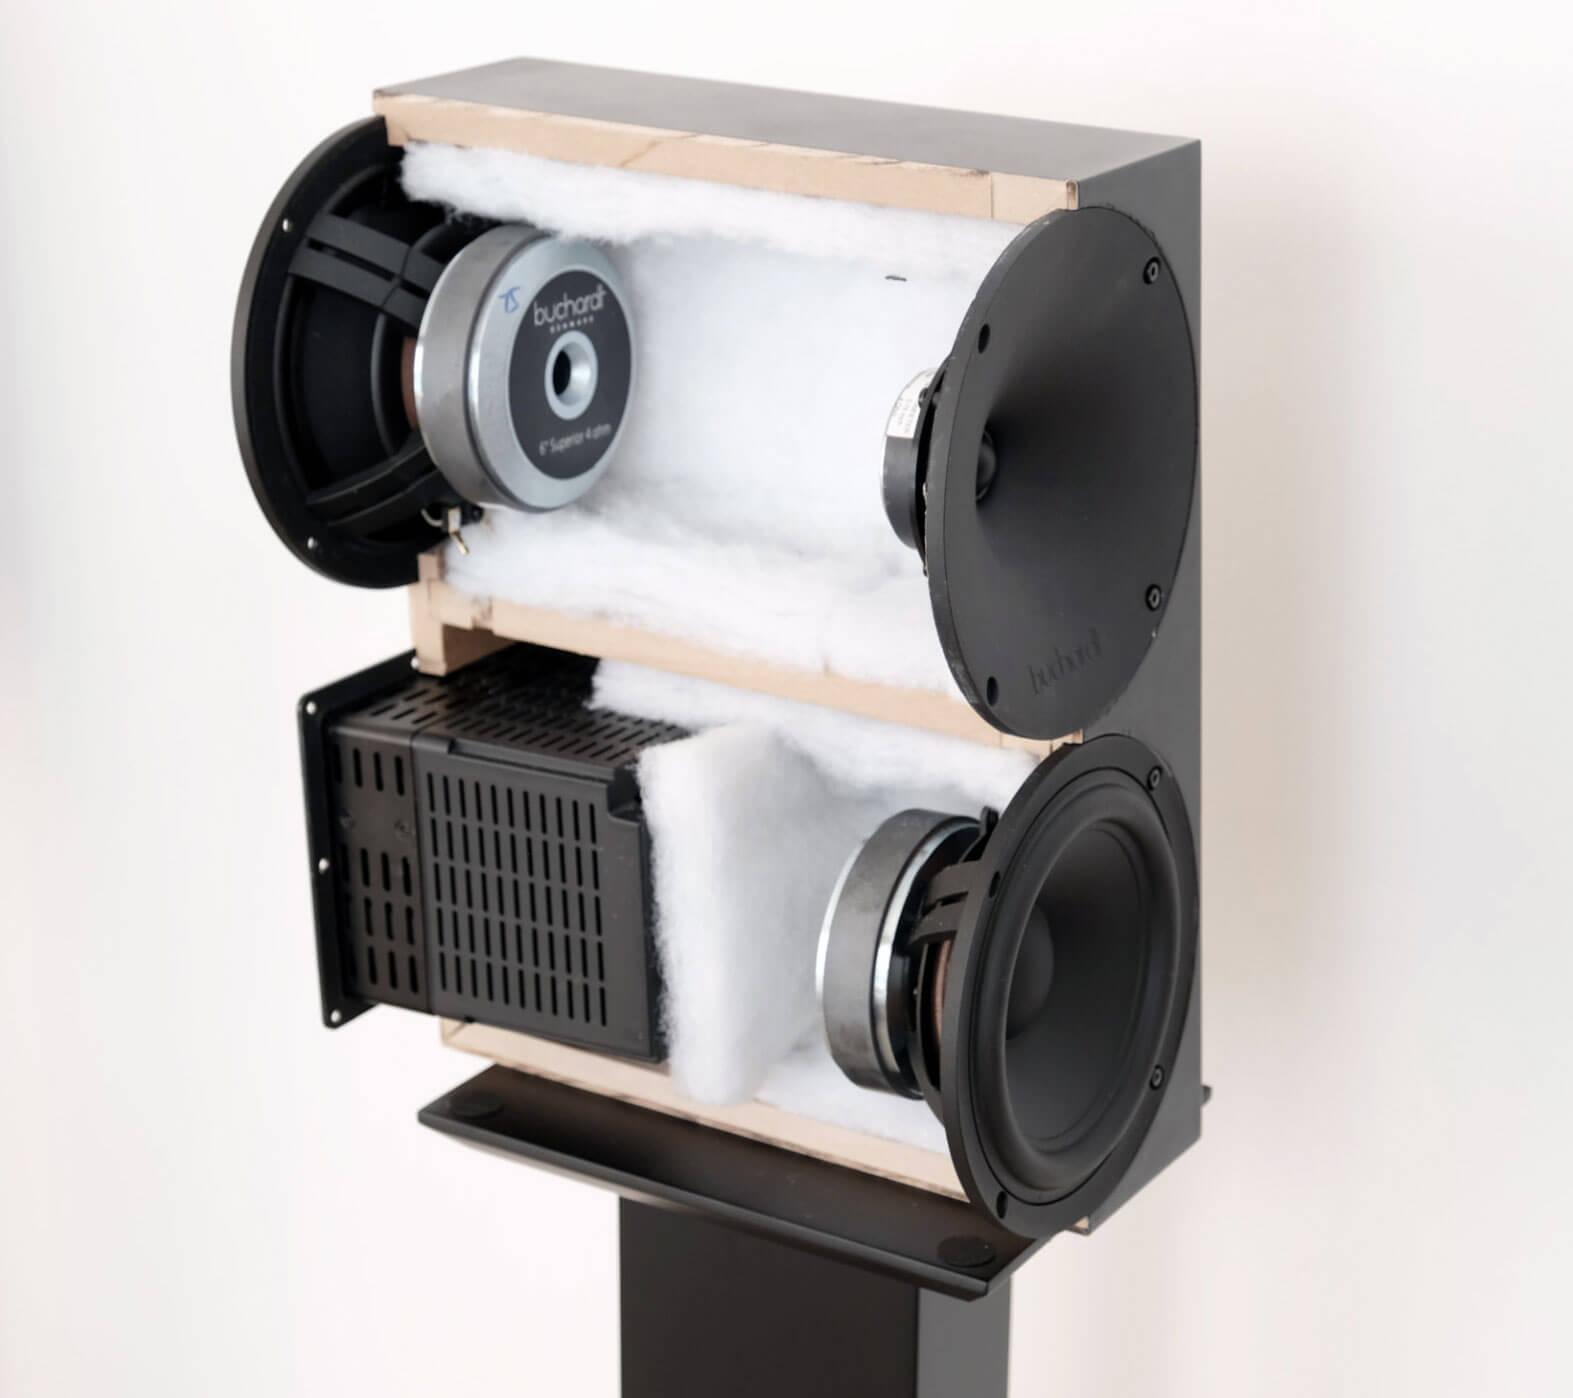 Buchardt A500 - Blick ins Innere